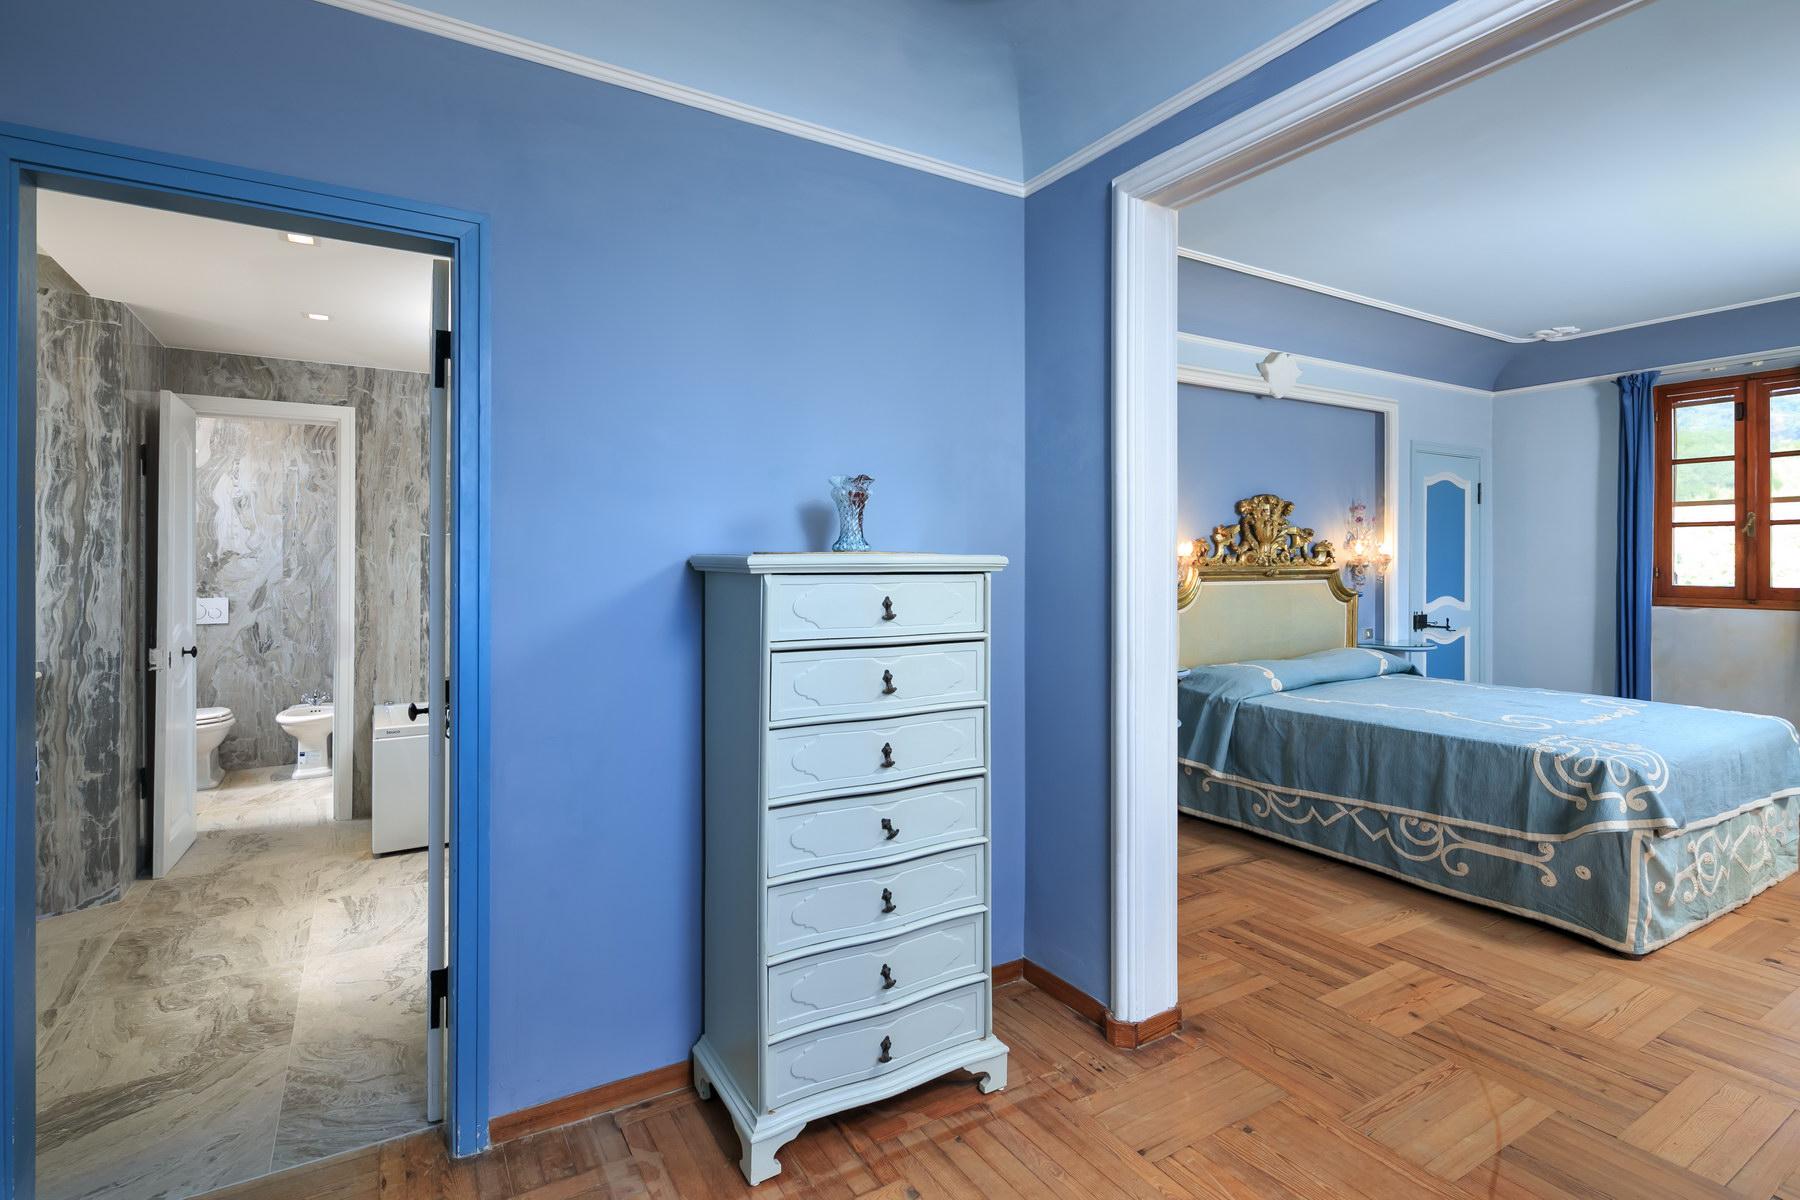 Villa in Vendita a Lerici: 5 locali, 620 mq - Foto 15